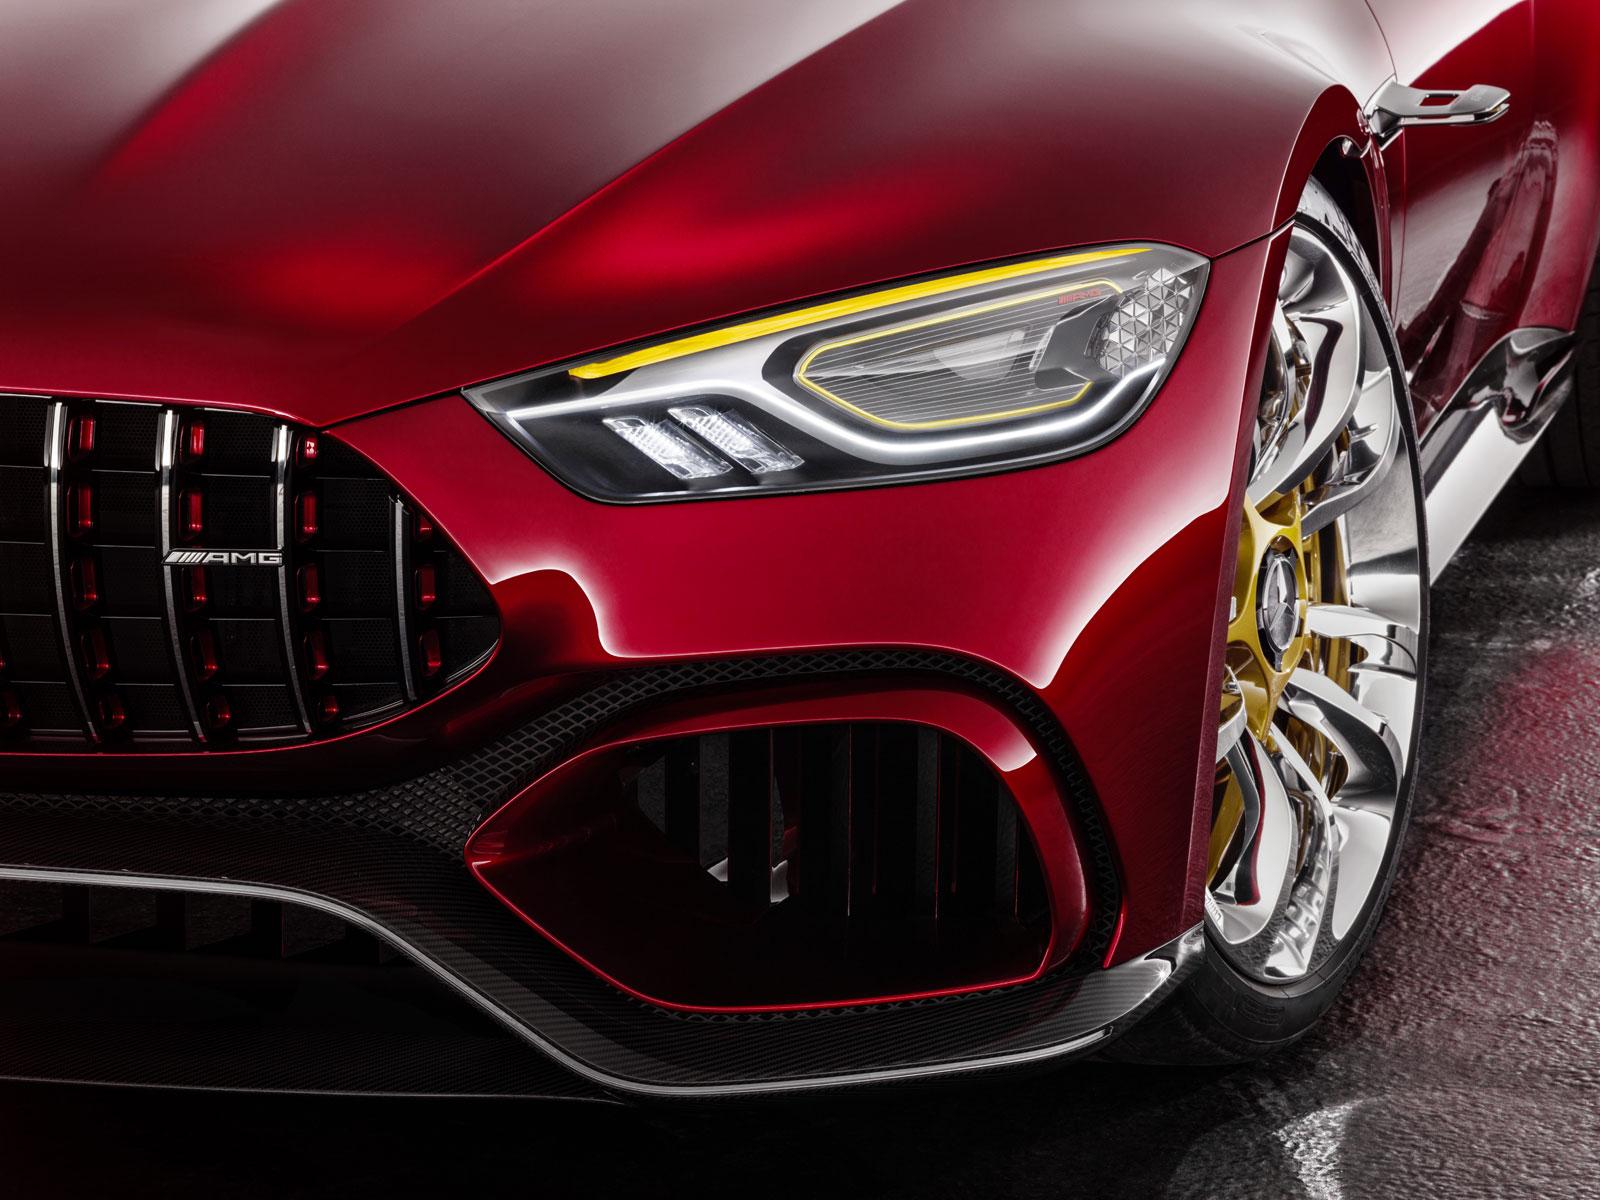 Mercedes-AMG-GT-Concept-Headlight